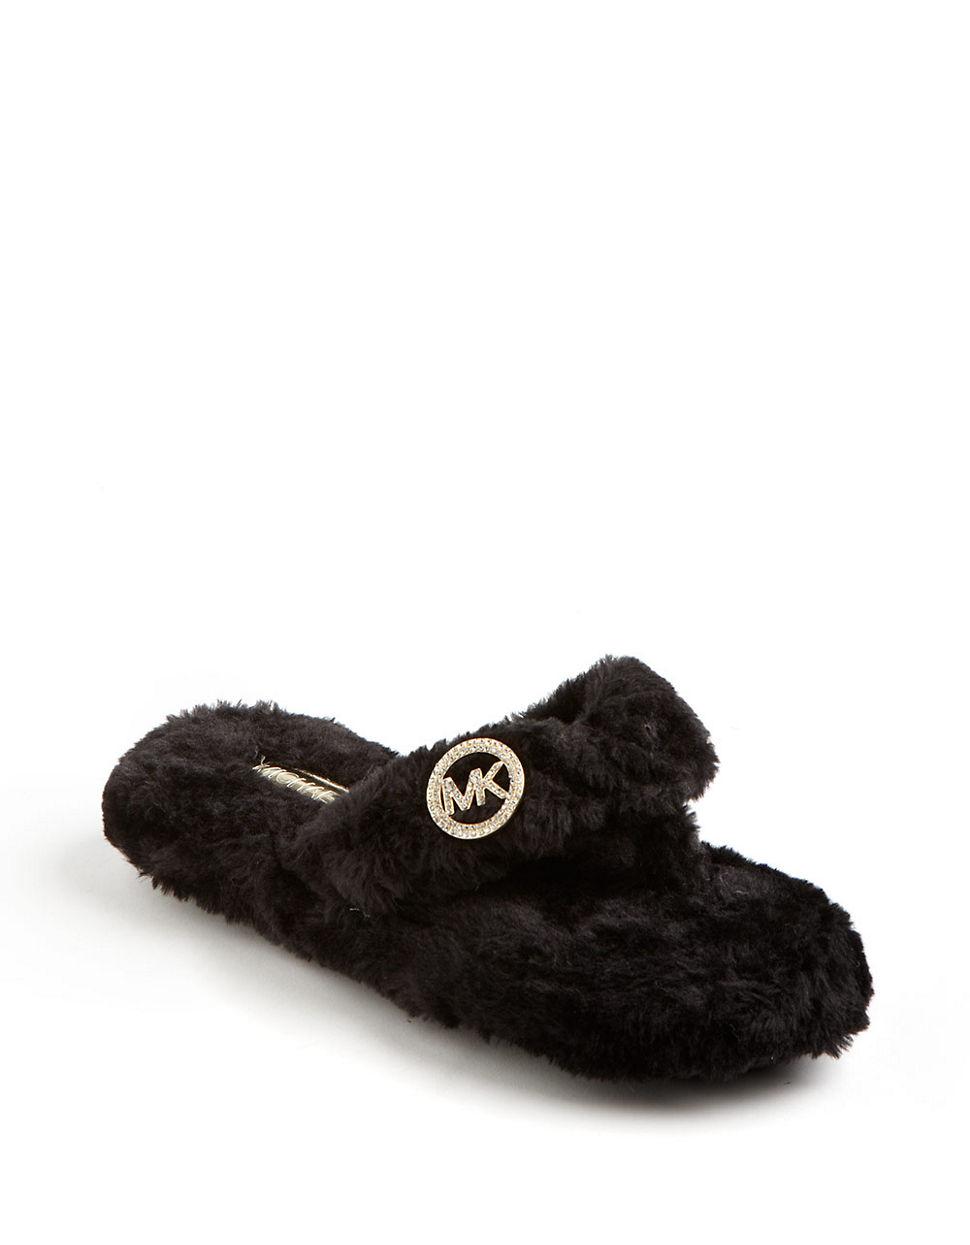 121ef50e92cd Source https   www.lyst.com shoes michael-by-michael-kors-faux-fur-thong- slippers-black